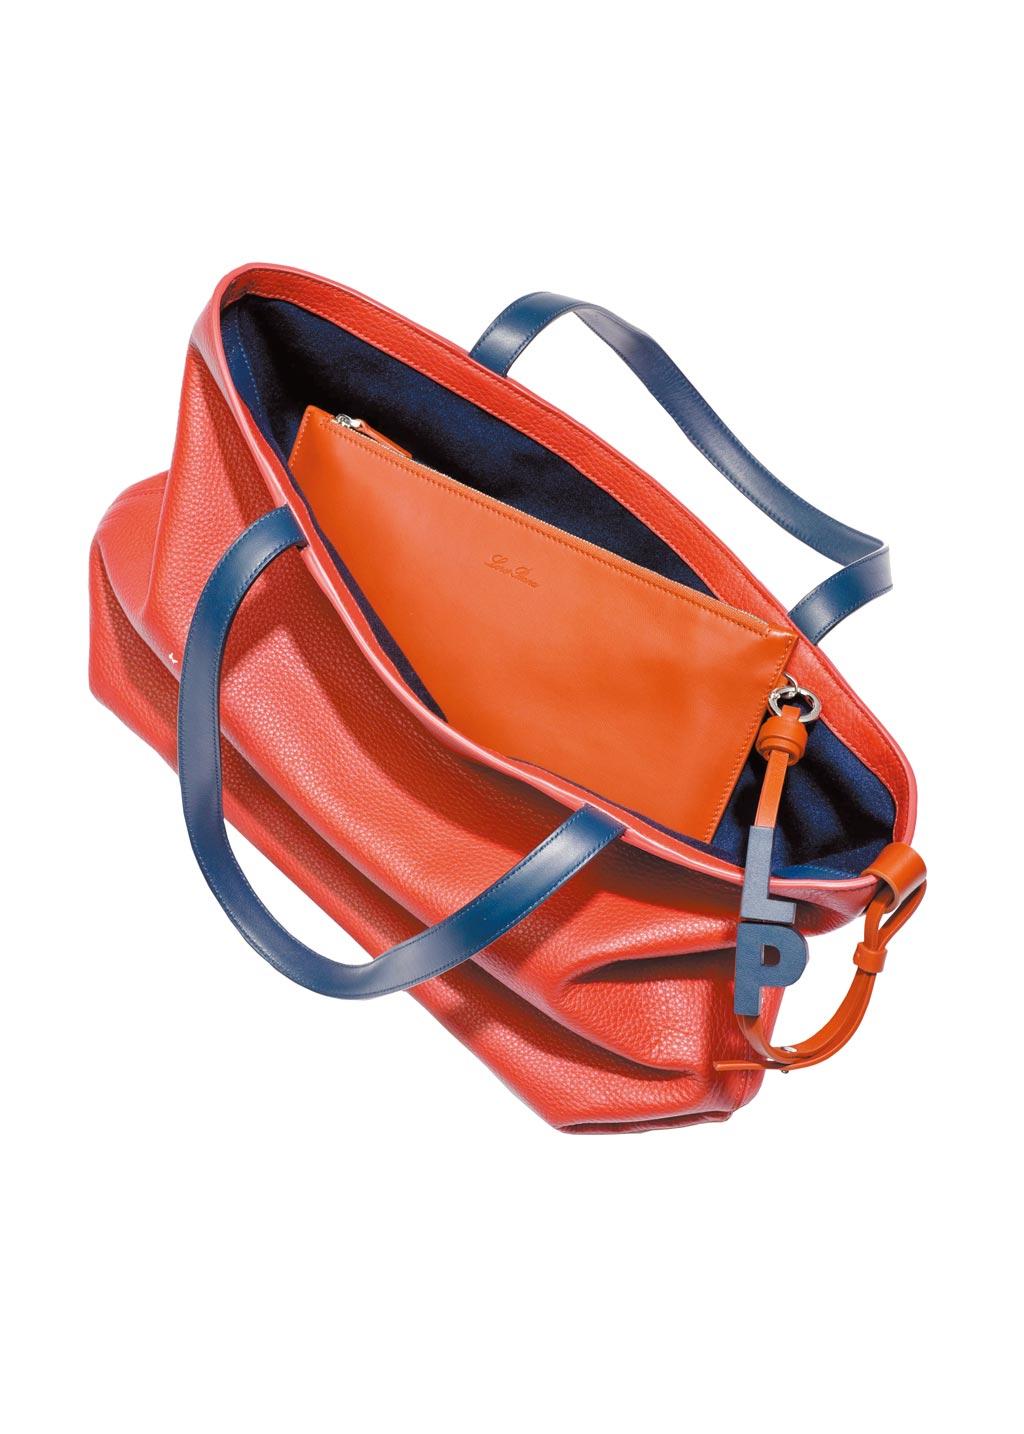 Loro Piana Inside Out可供雙面使用是其最大特色之一。(Loro Piana提供)